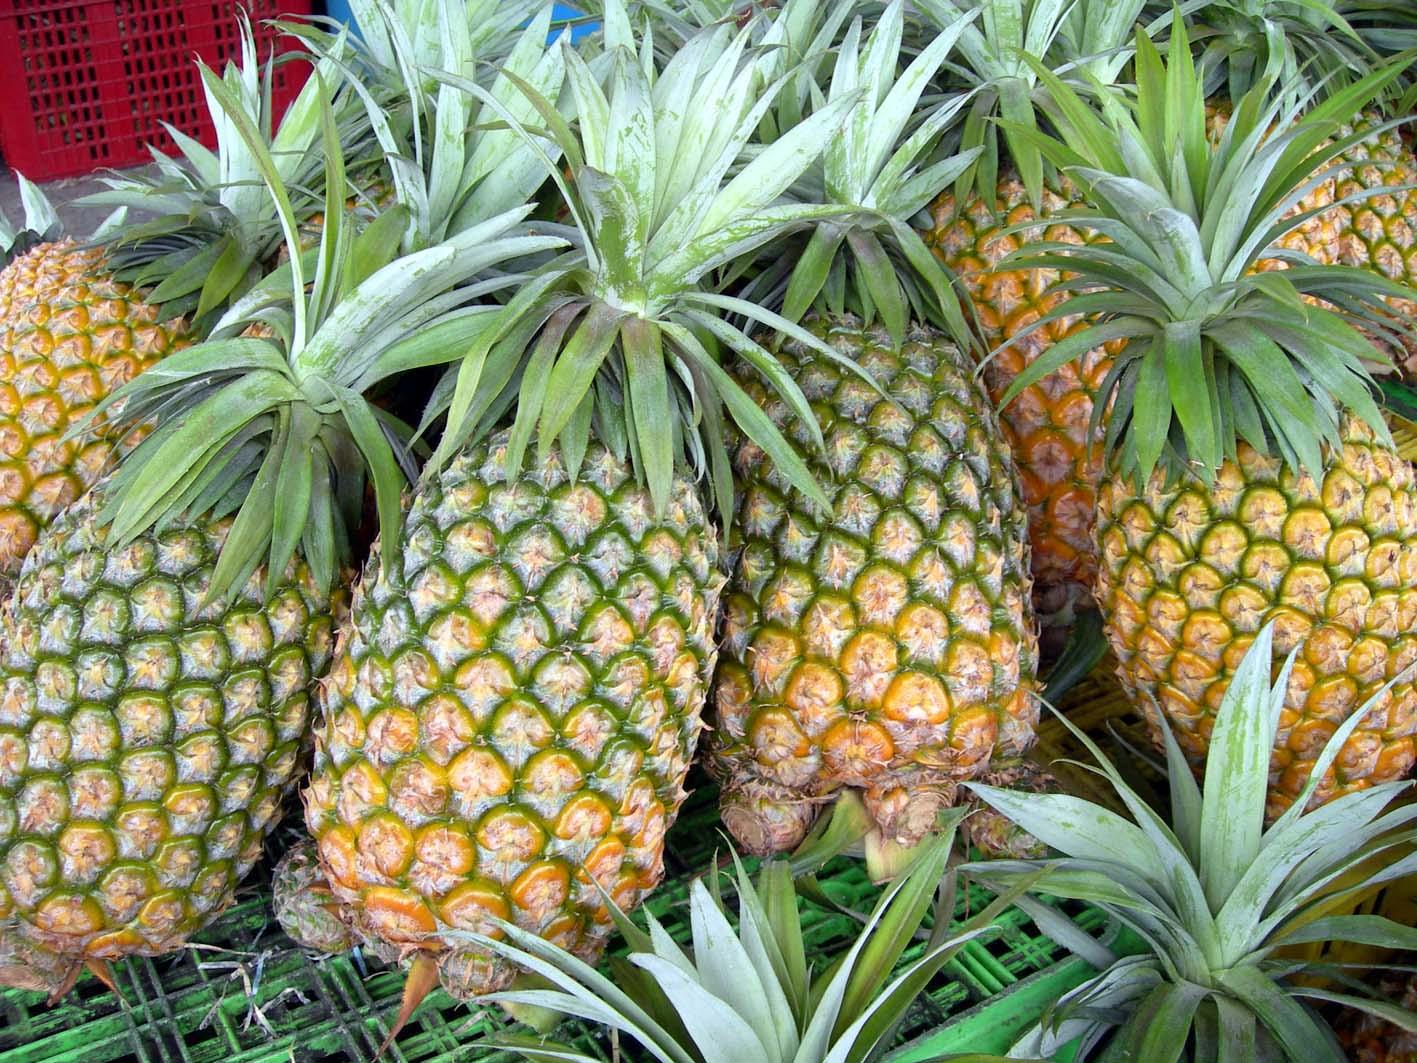 ananas , ananas ke fayde,benefits of pineapple , benefits,pineapple health benefits,health facts,pineapple benefit for health,health,health benefits, pineapple health benefits, pineapple benefits